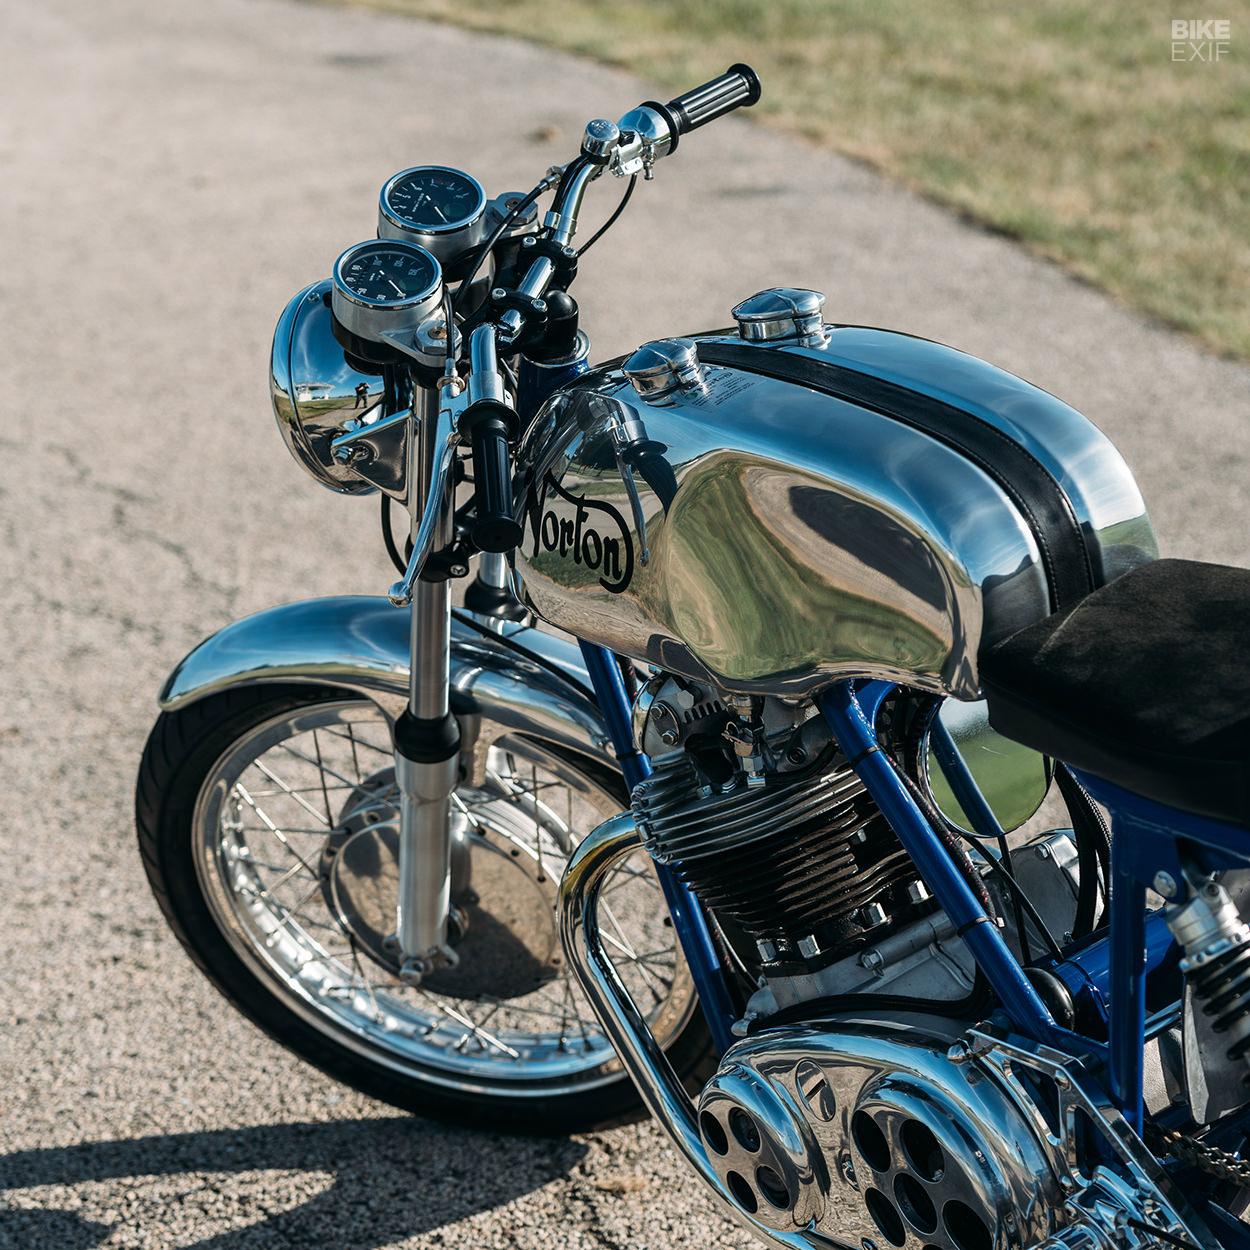 1971 Norton Commando 750 classic motorcycle restored by Retrospeed